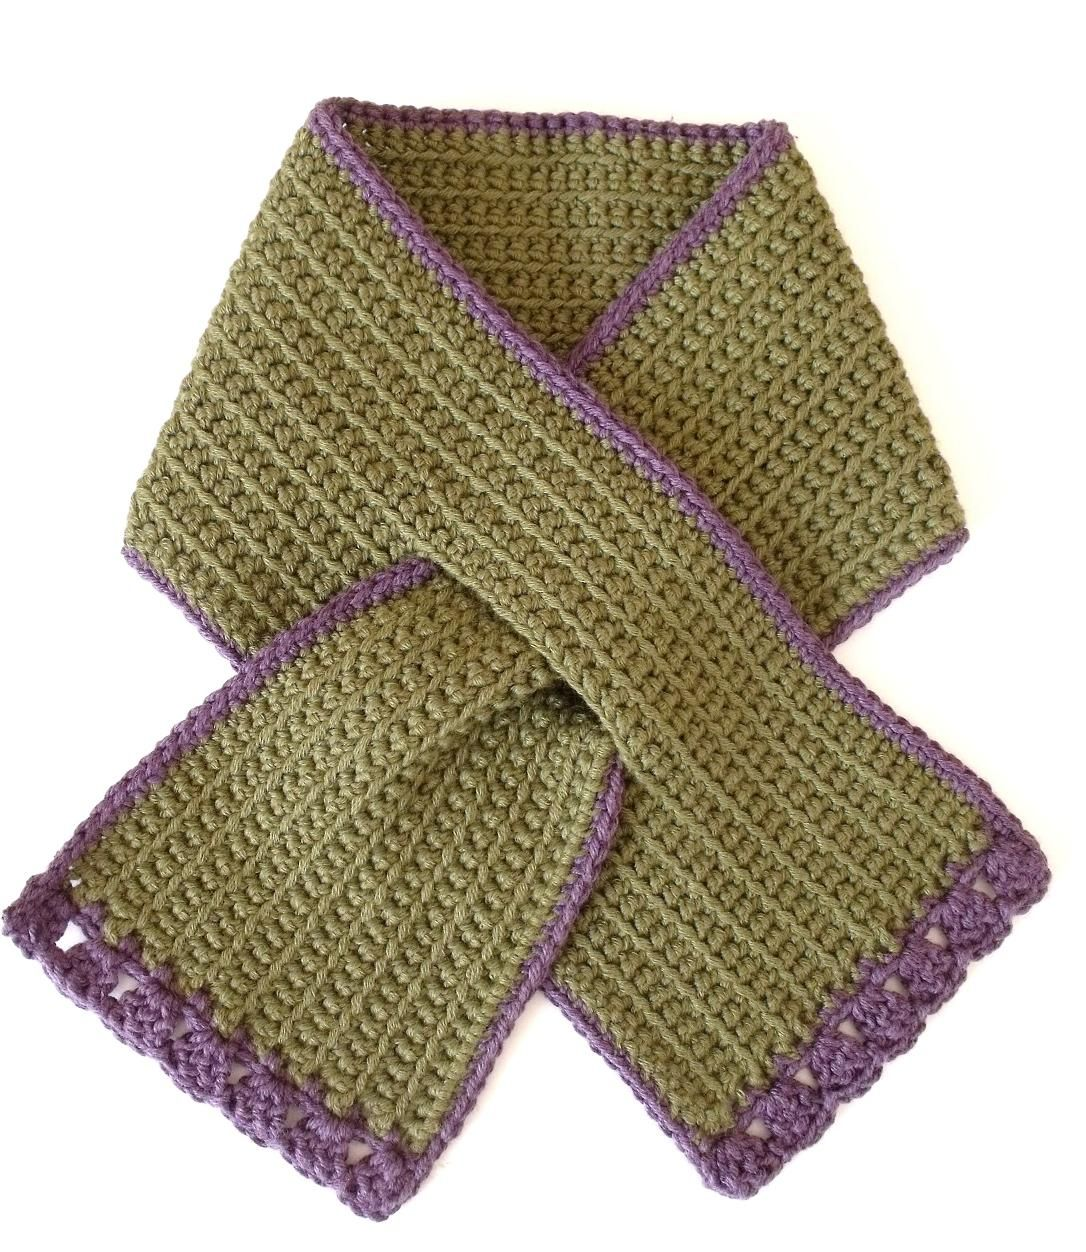 Coats keyhole tuck scarf knit pattern free with red heart knit coats keyhole tuck scarf knit pattern free with red heart bankloansurffo Image collections